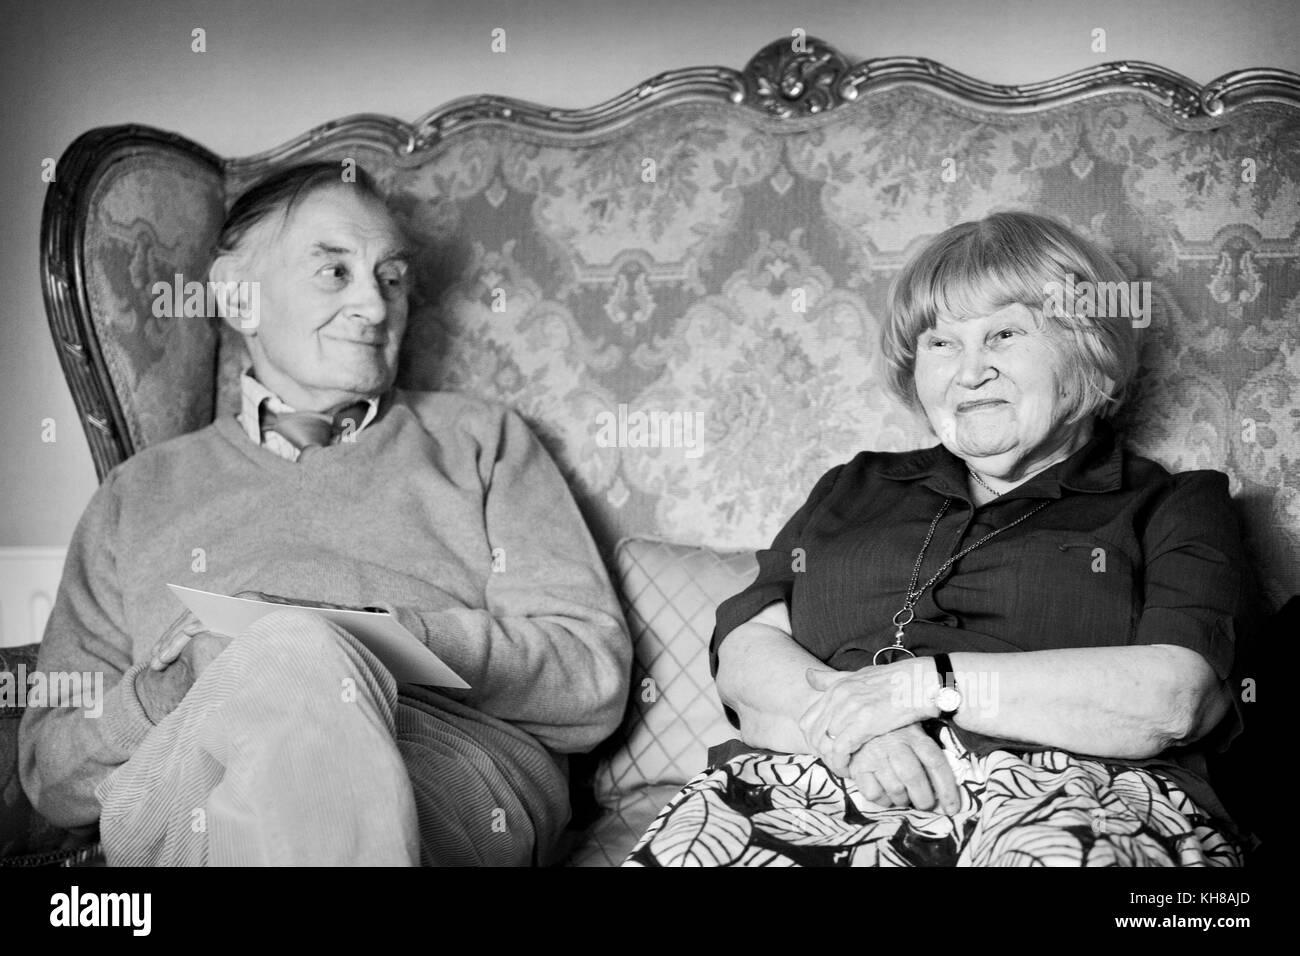 Photographer Jane Bown (13 March 1925 – 21 December 2014) and cartoonist/ illustrator Haro Hodson, B&W portrait - Stock Image